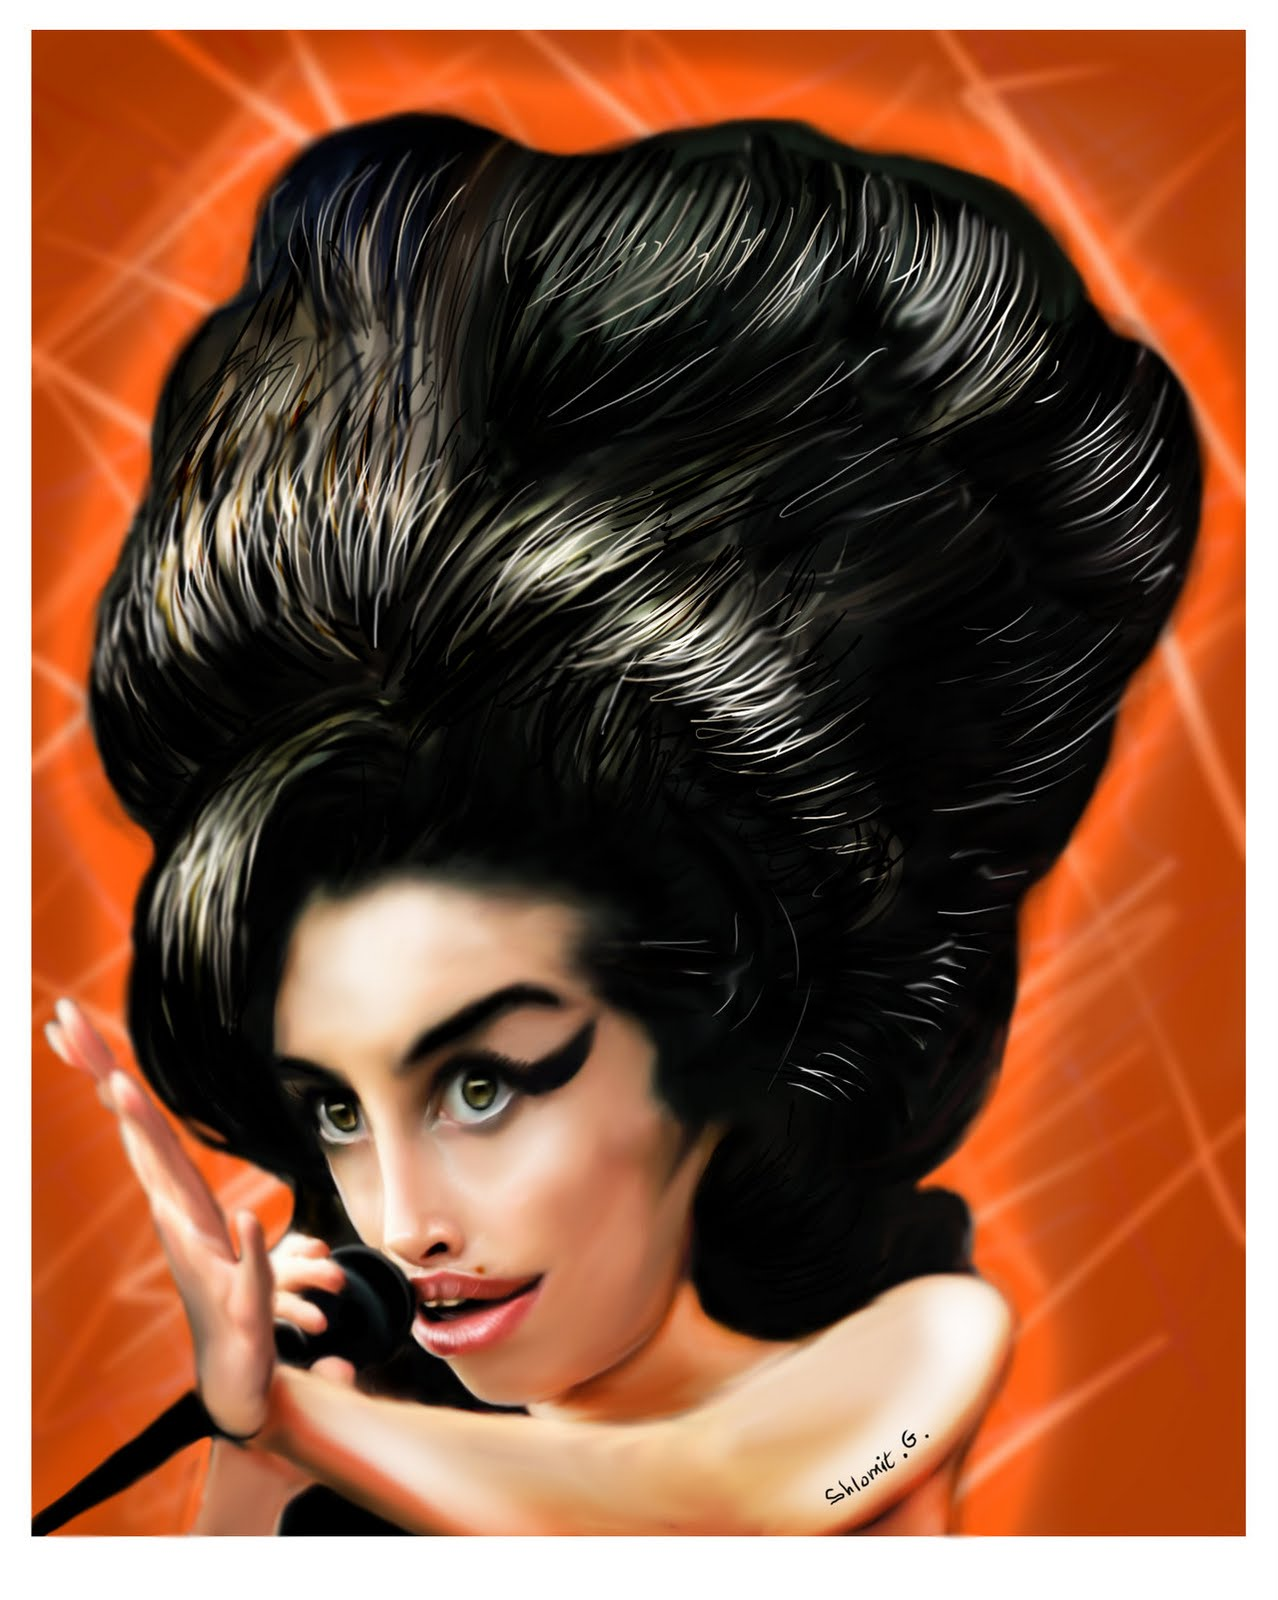 http://4.bp.blogspot.com/-PKRHJsofw6o/Te_OnbXvPtI/AAAAAAAAG70/-whU3XP4hDI/s1600/Amy_Winehouse_caricature_by_shlomit.jpg